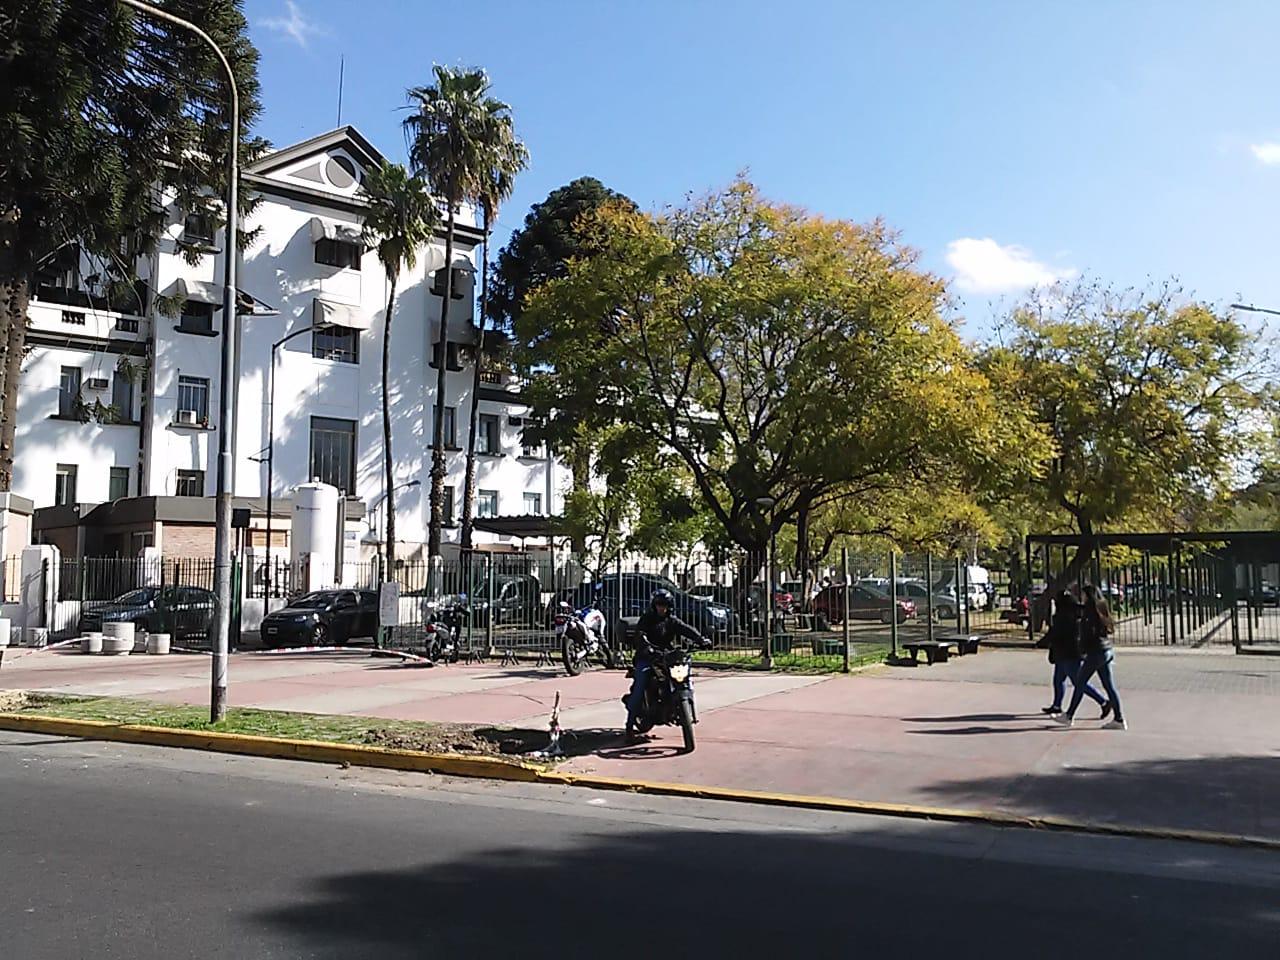 Parque_Centenario